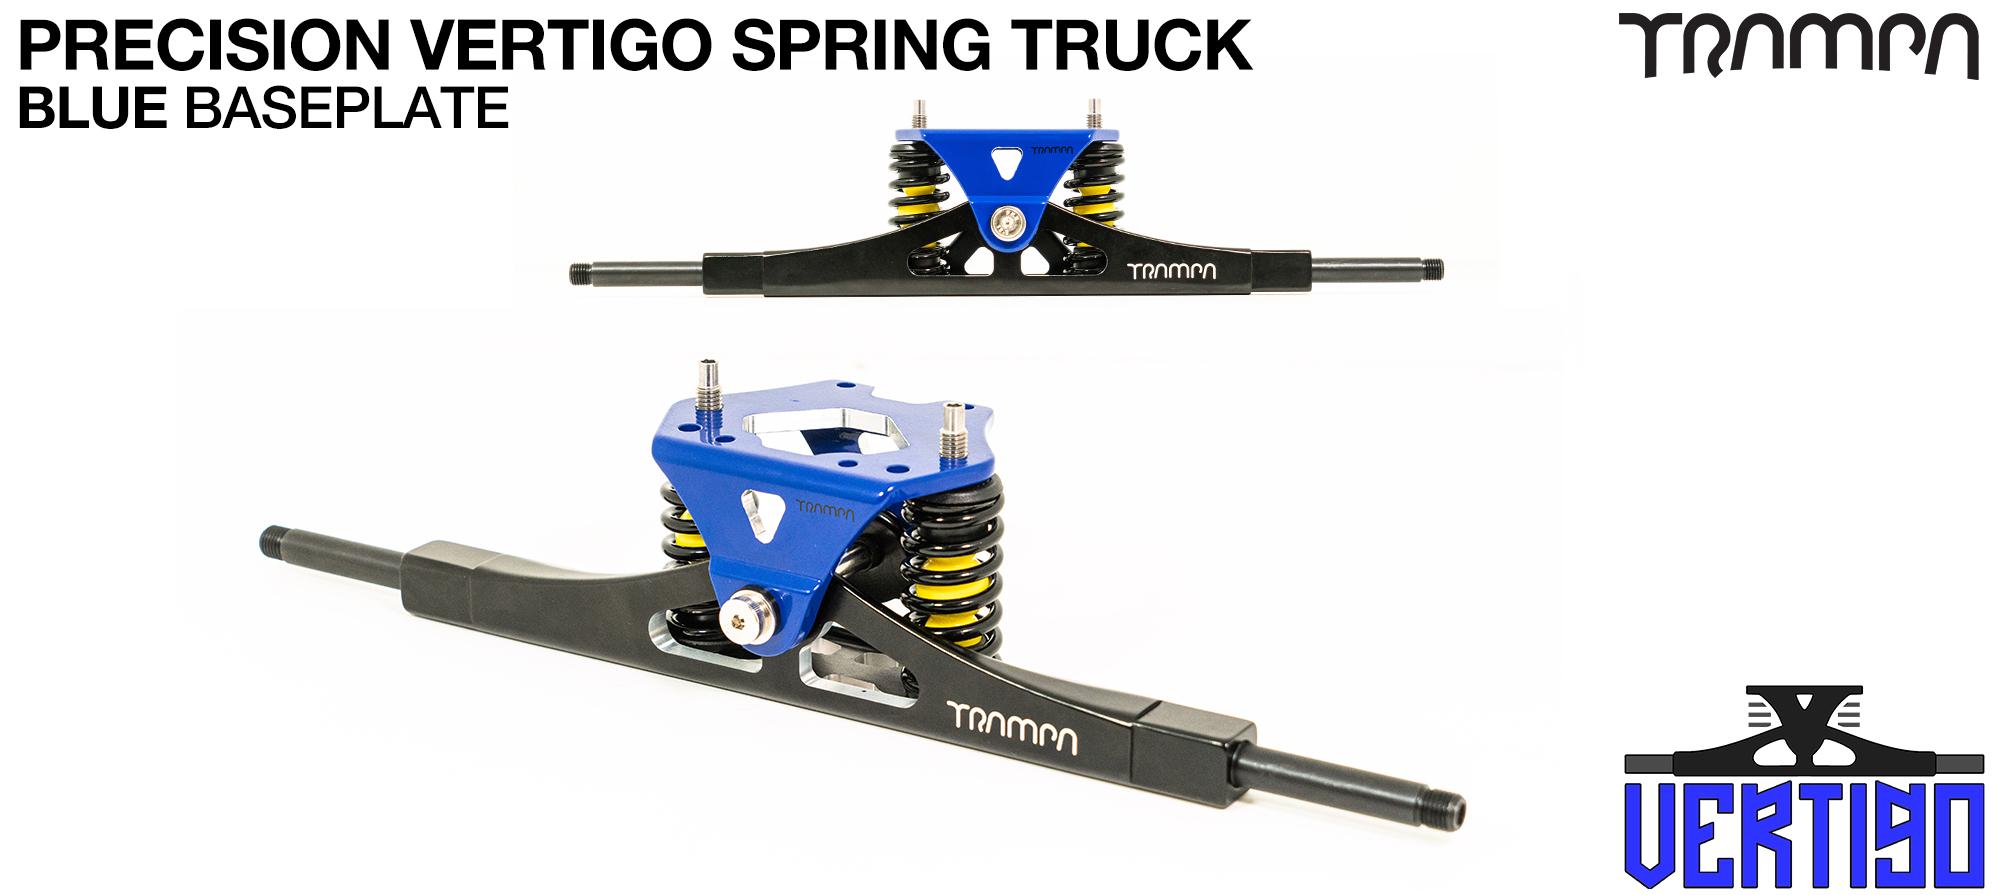 PRECISION CNC VERTIGO Truck Powder-Coated NAVY - 12mm Hollow Axles with BLUE CNC baseplate & Steel Kingpin